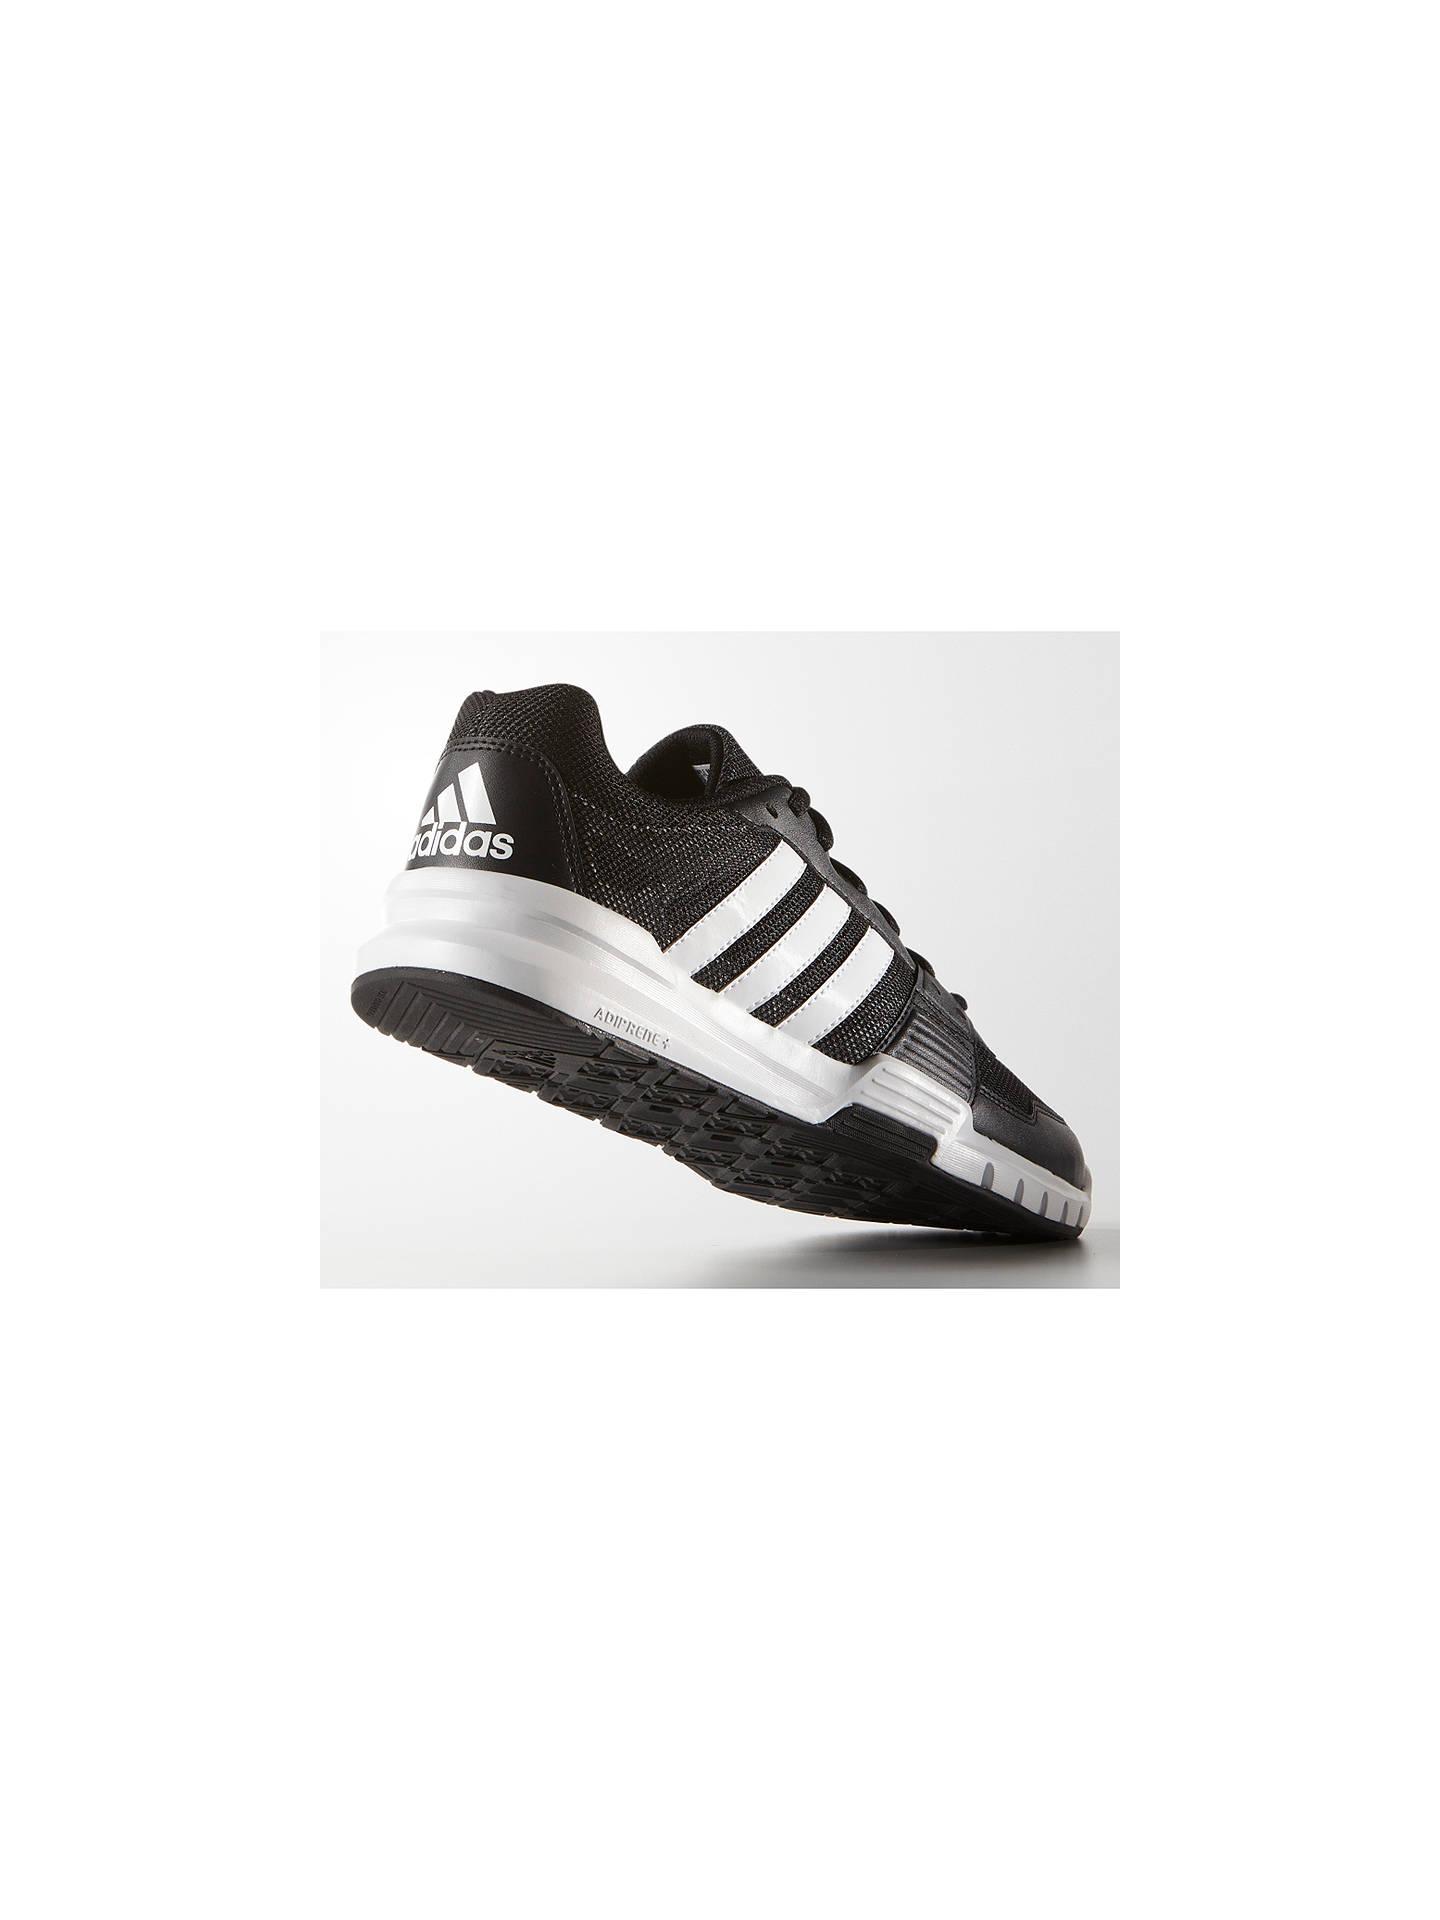 Adidas Essential Star 2.0 Men's Cross Trainers, BlackWhite